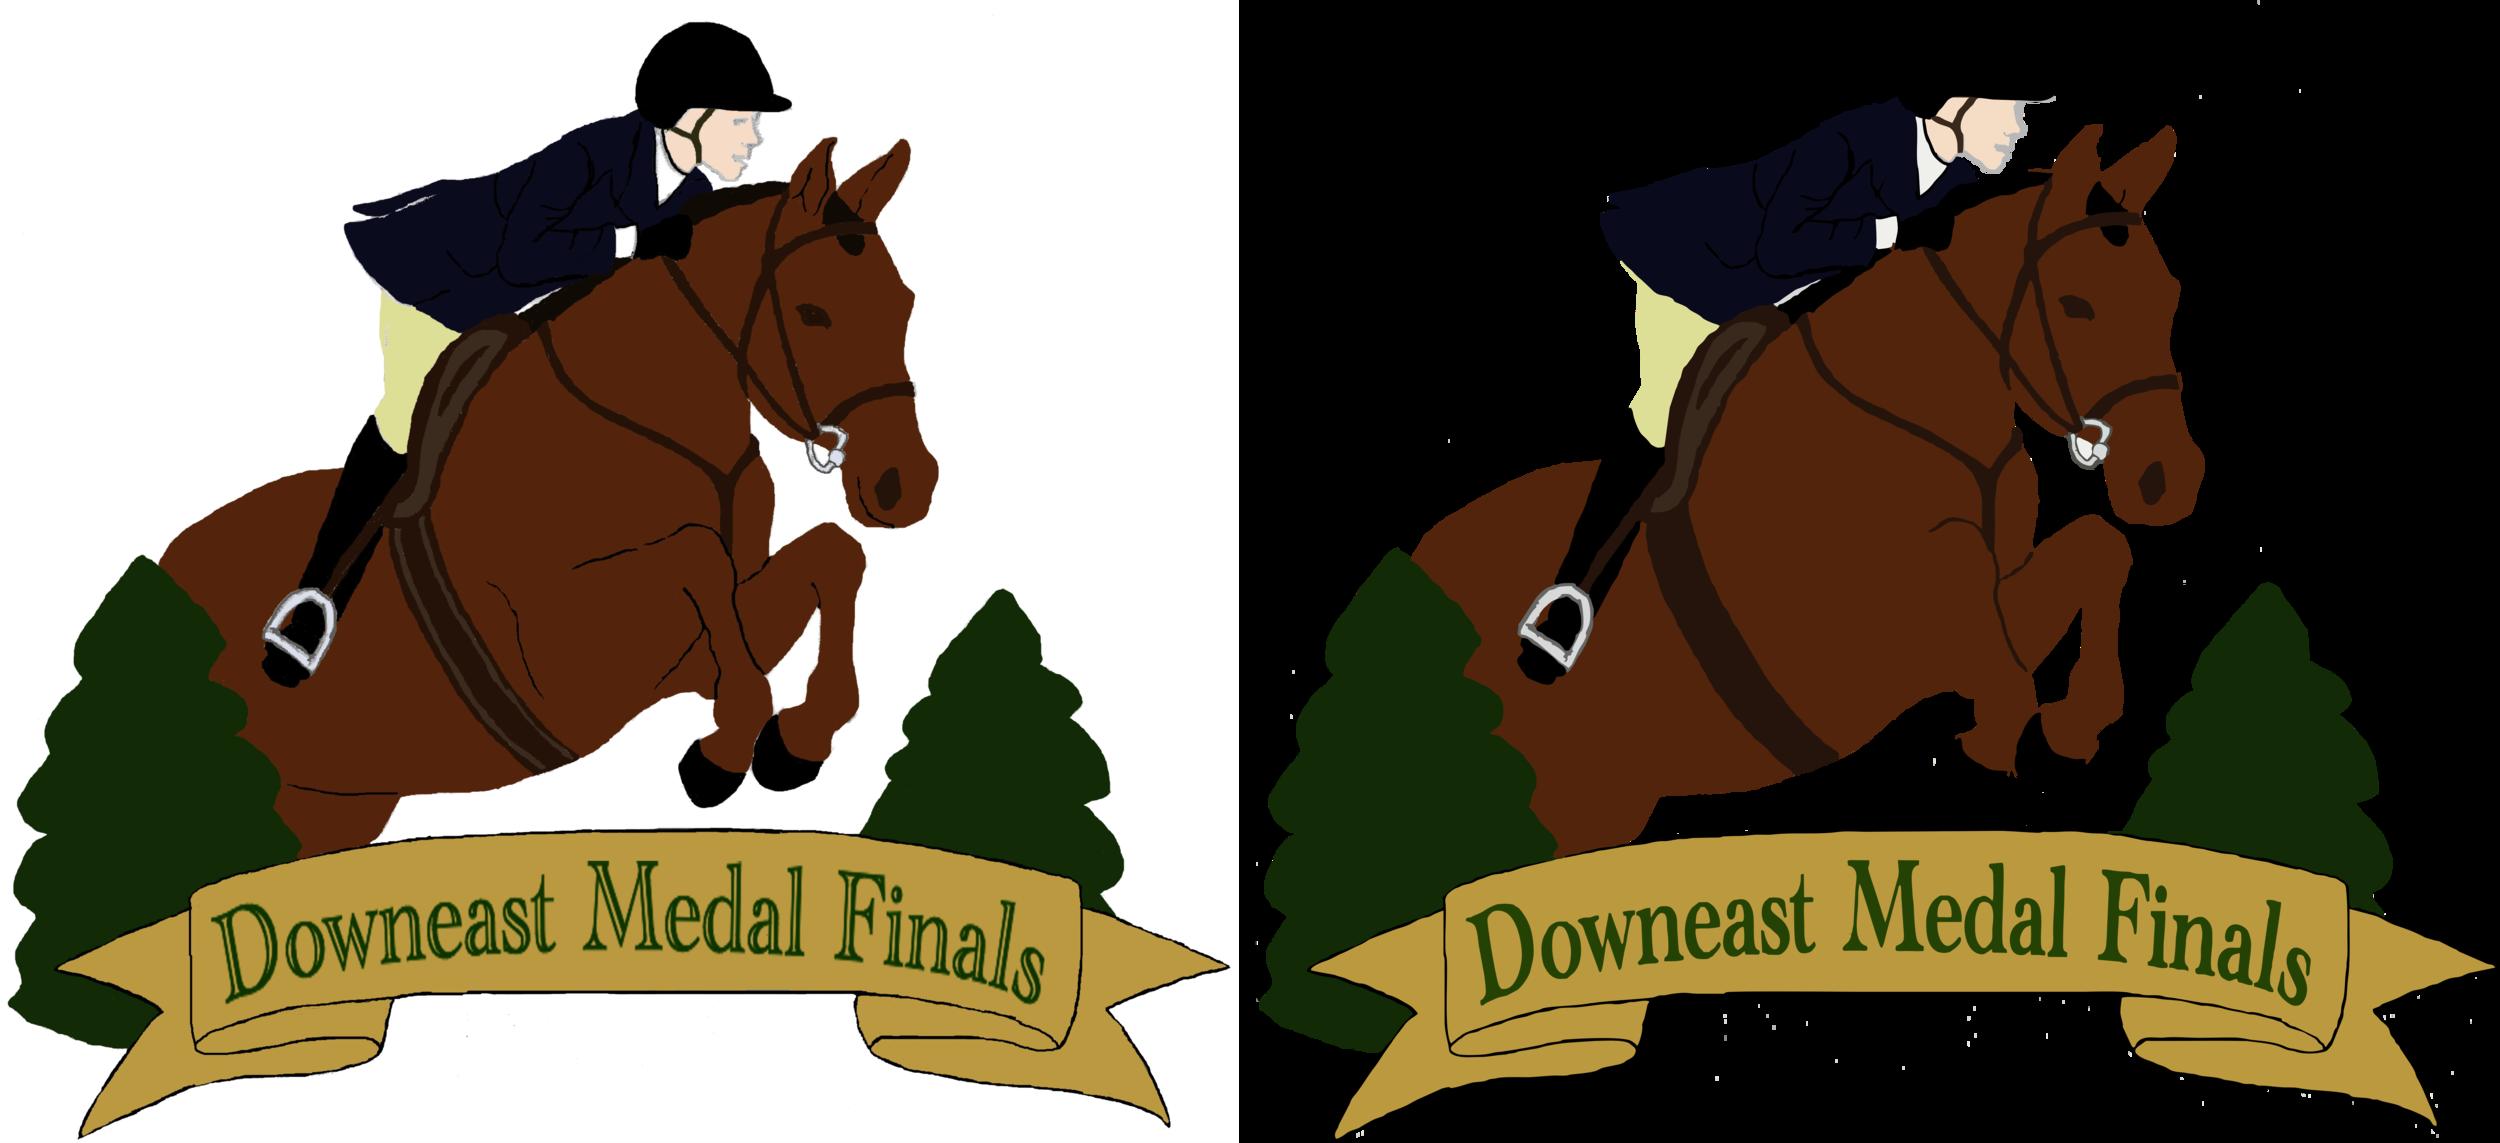 Downeast Medal Finals